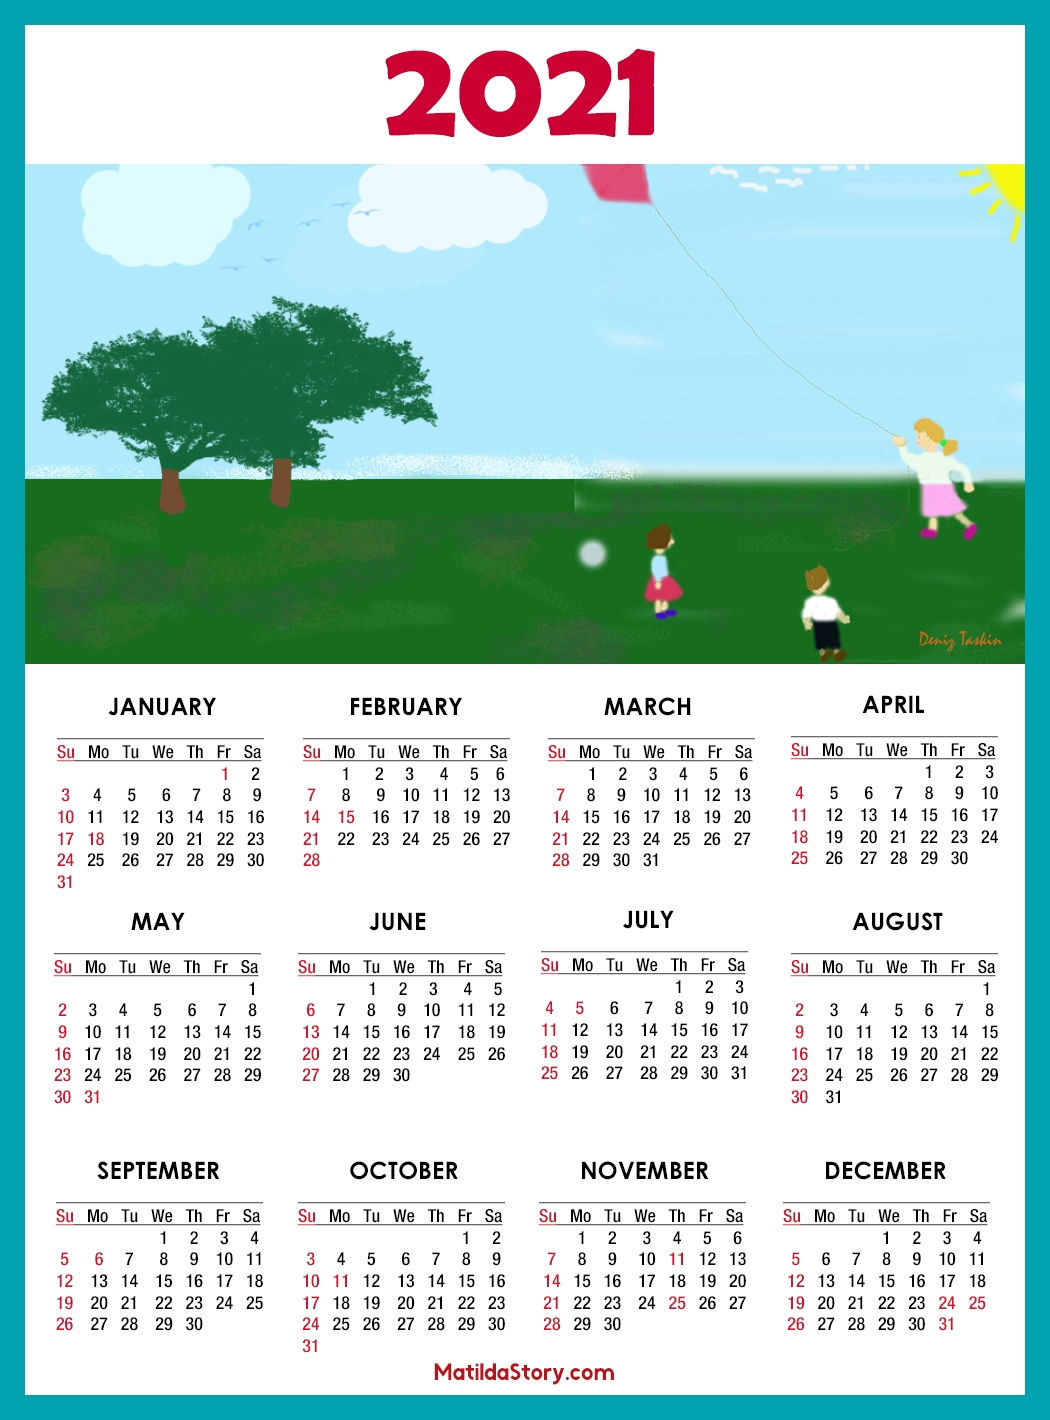 calendar 2021 printable with us holidays sunday start matildastory::Downloadable 2021 Calendar with Holidays